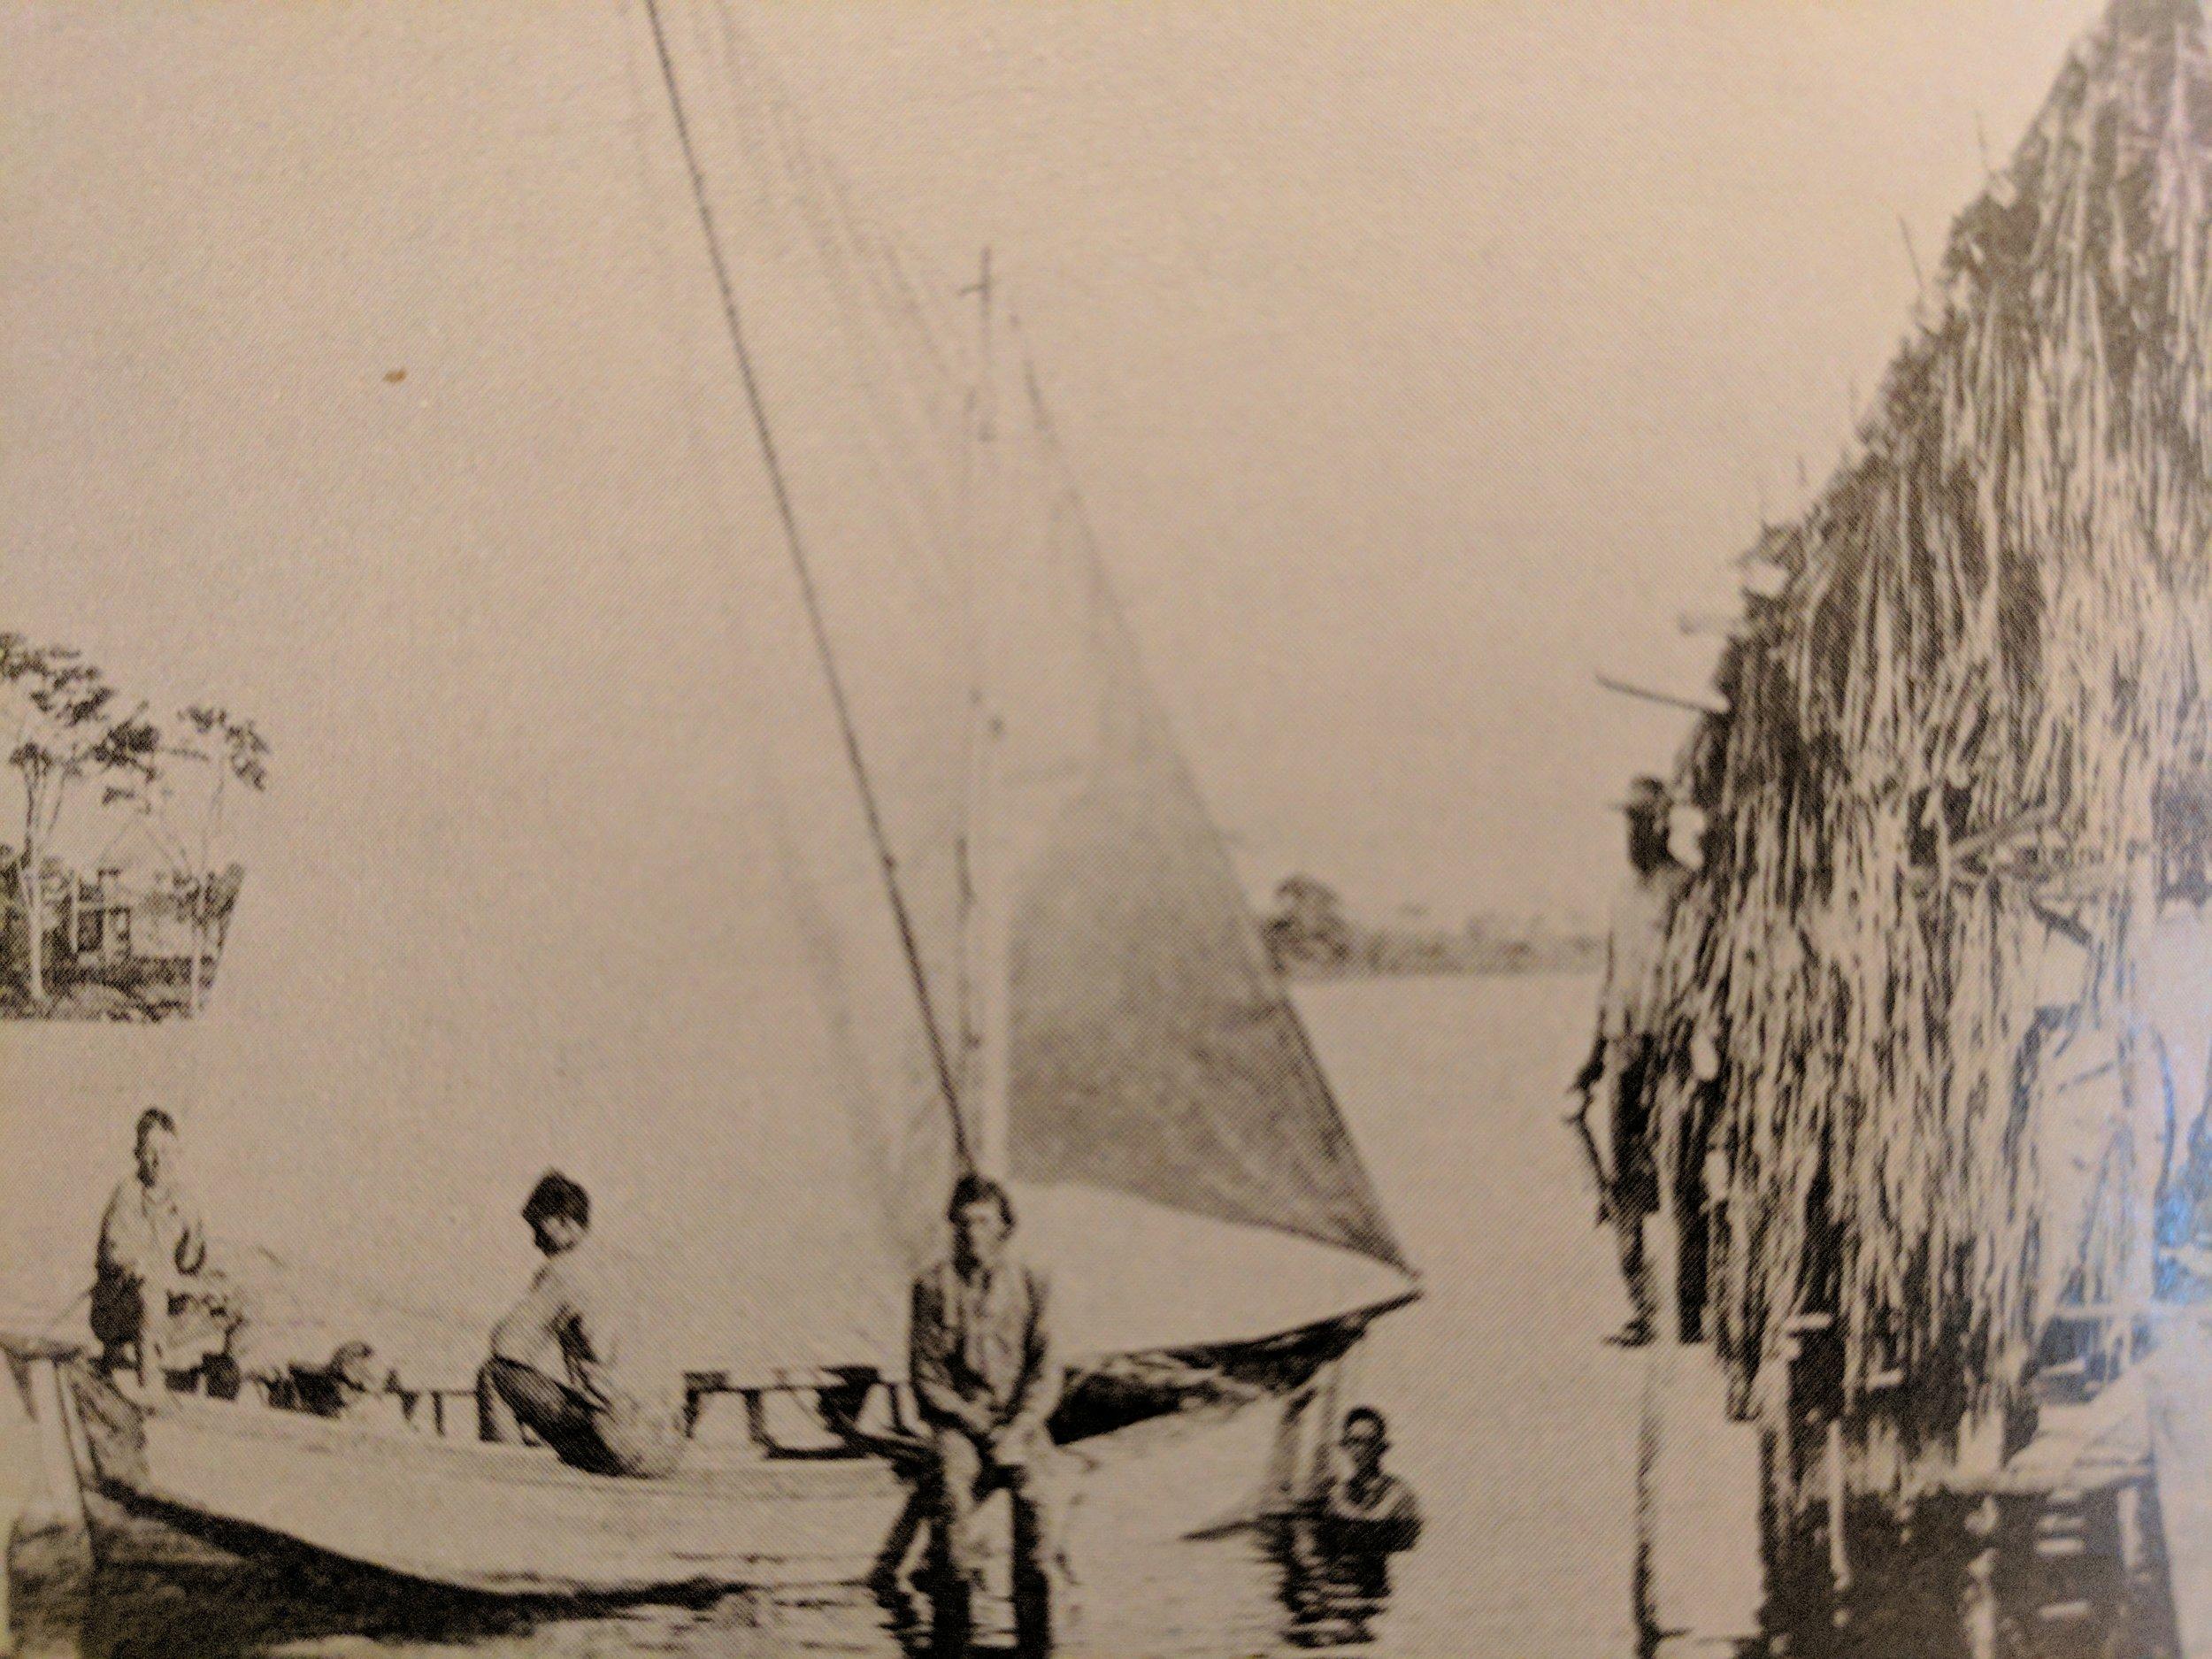 Mrs. Harris with the Blackburn boys. 1908, Blackburn Bay